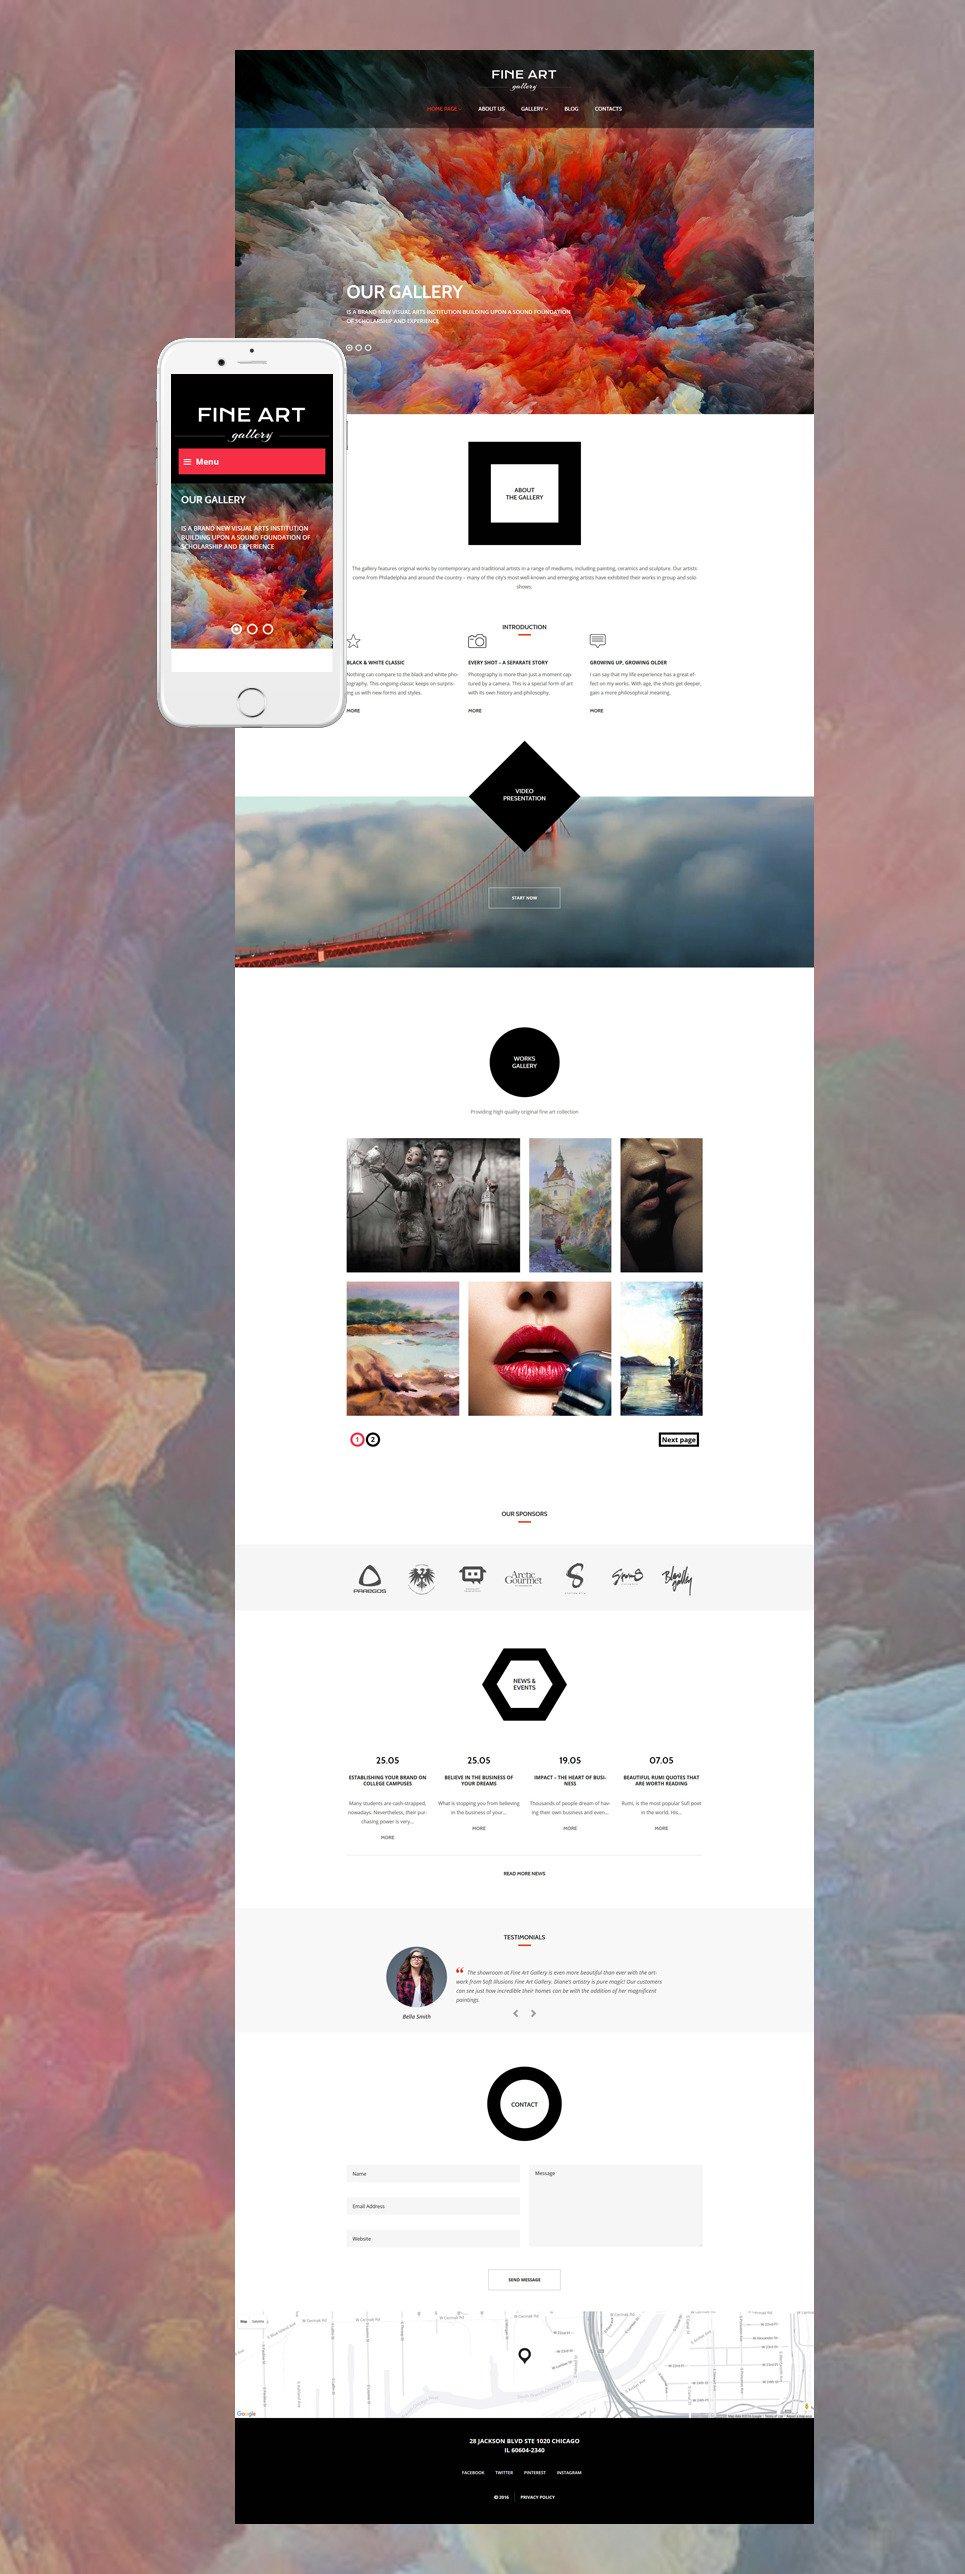 Art Gallery Responsive WordPress Theme New Screenshots BIG